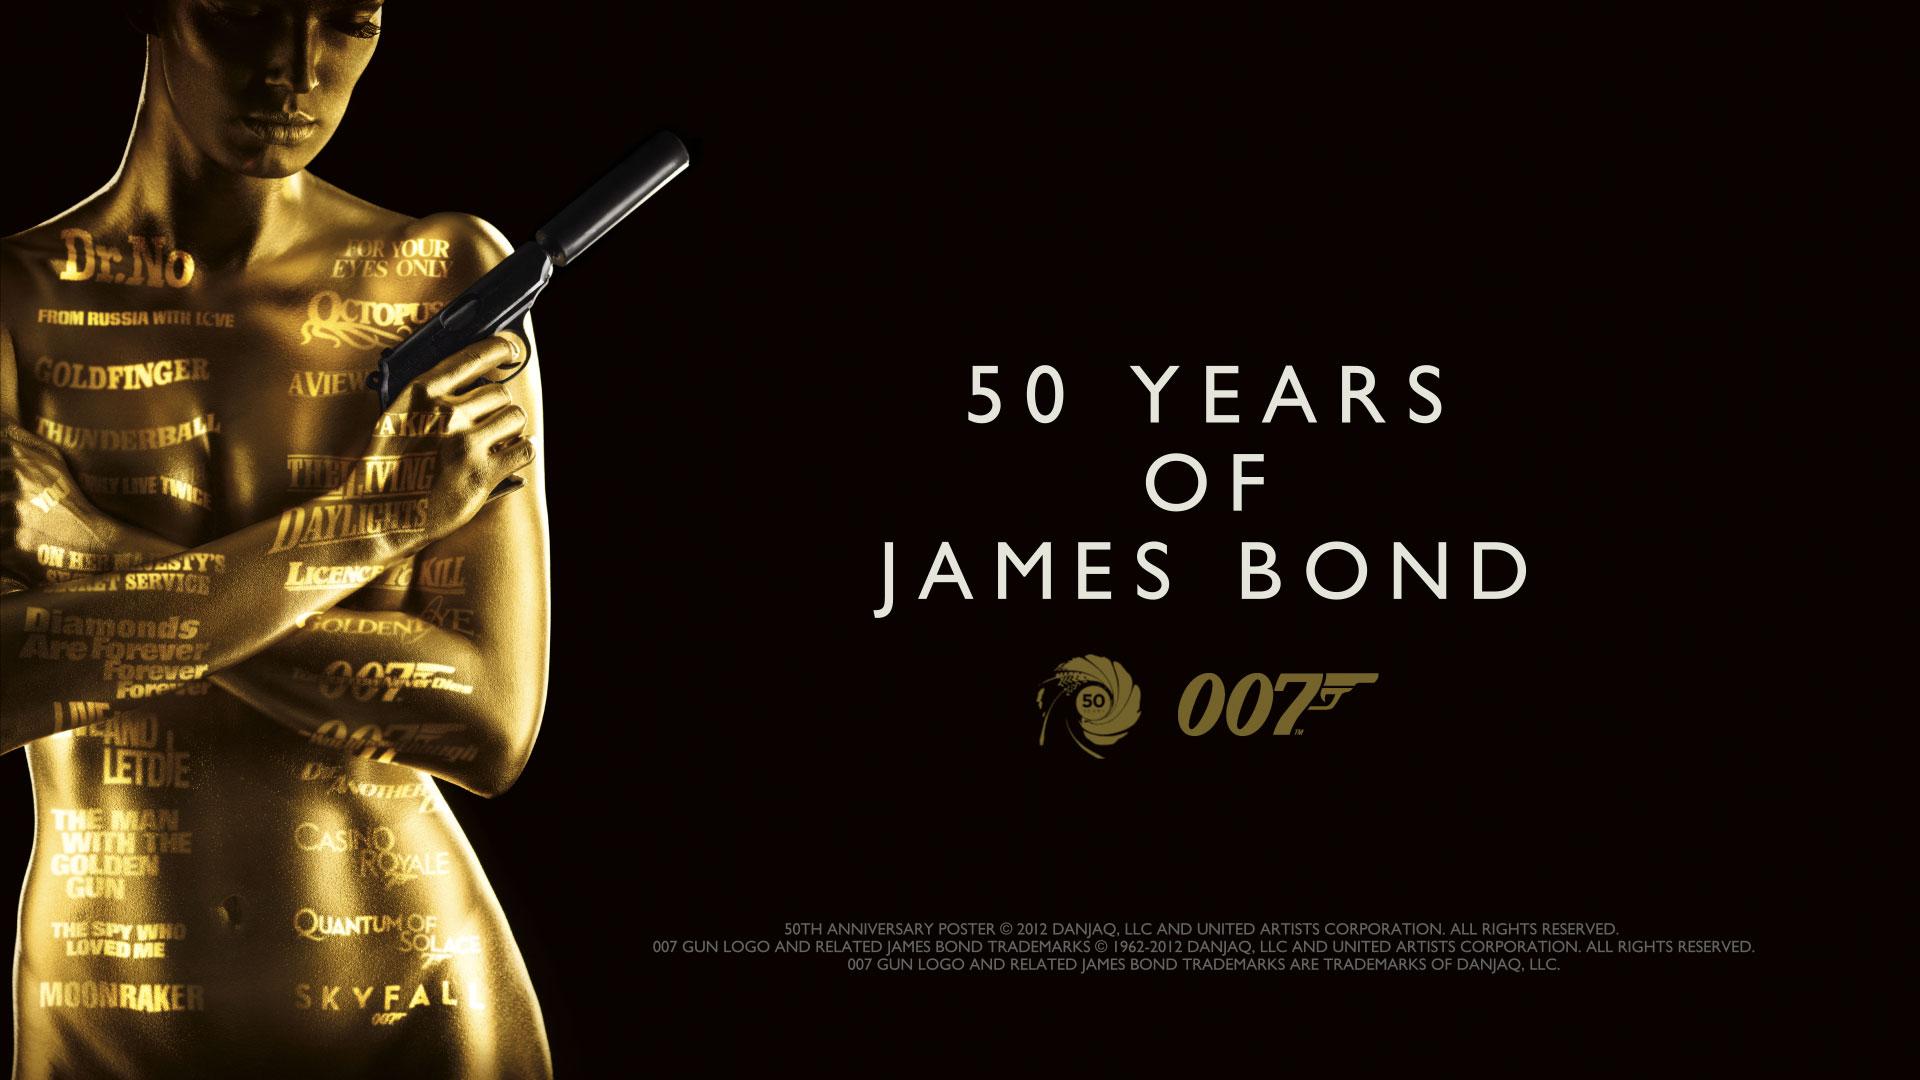 james bond 50 jaar blu ray James Bond Box Set   Blu Ray Release james bond 50 jaar blu ray